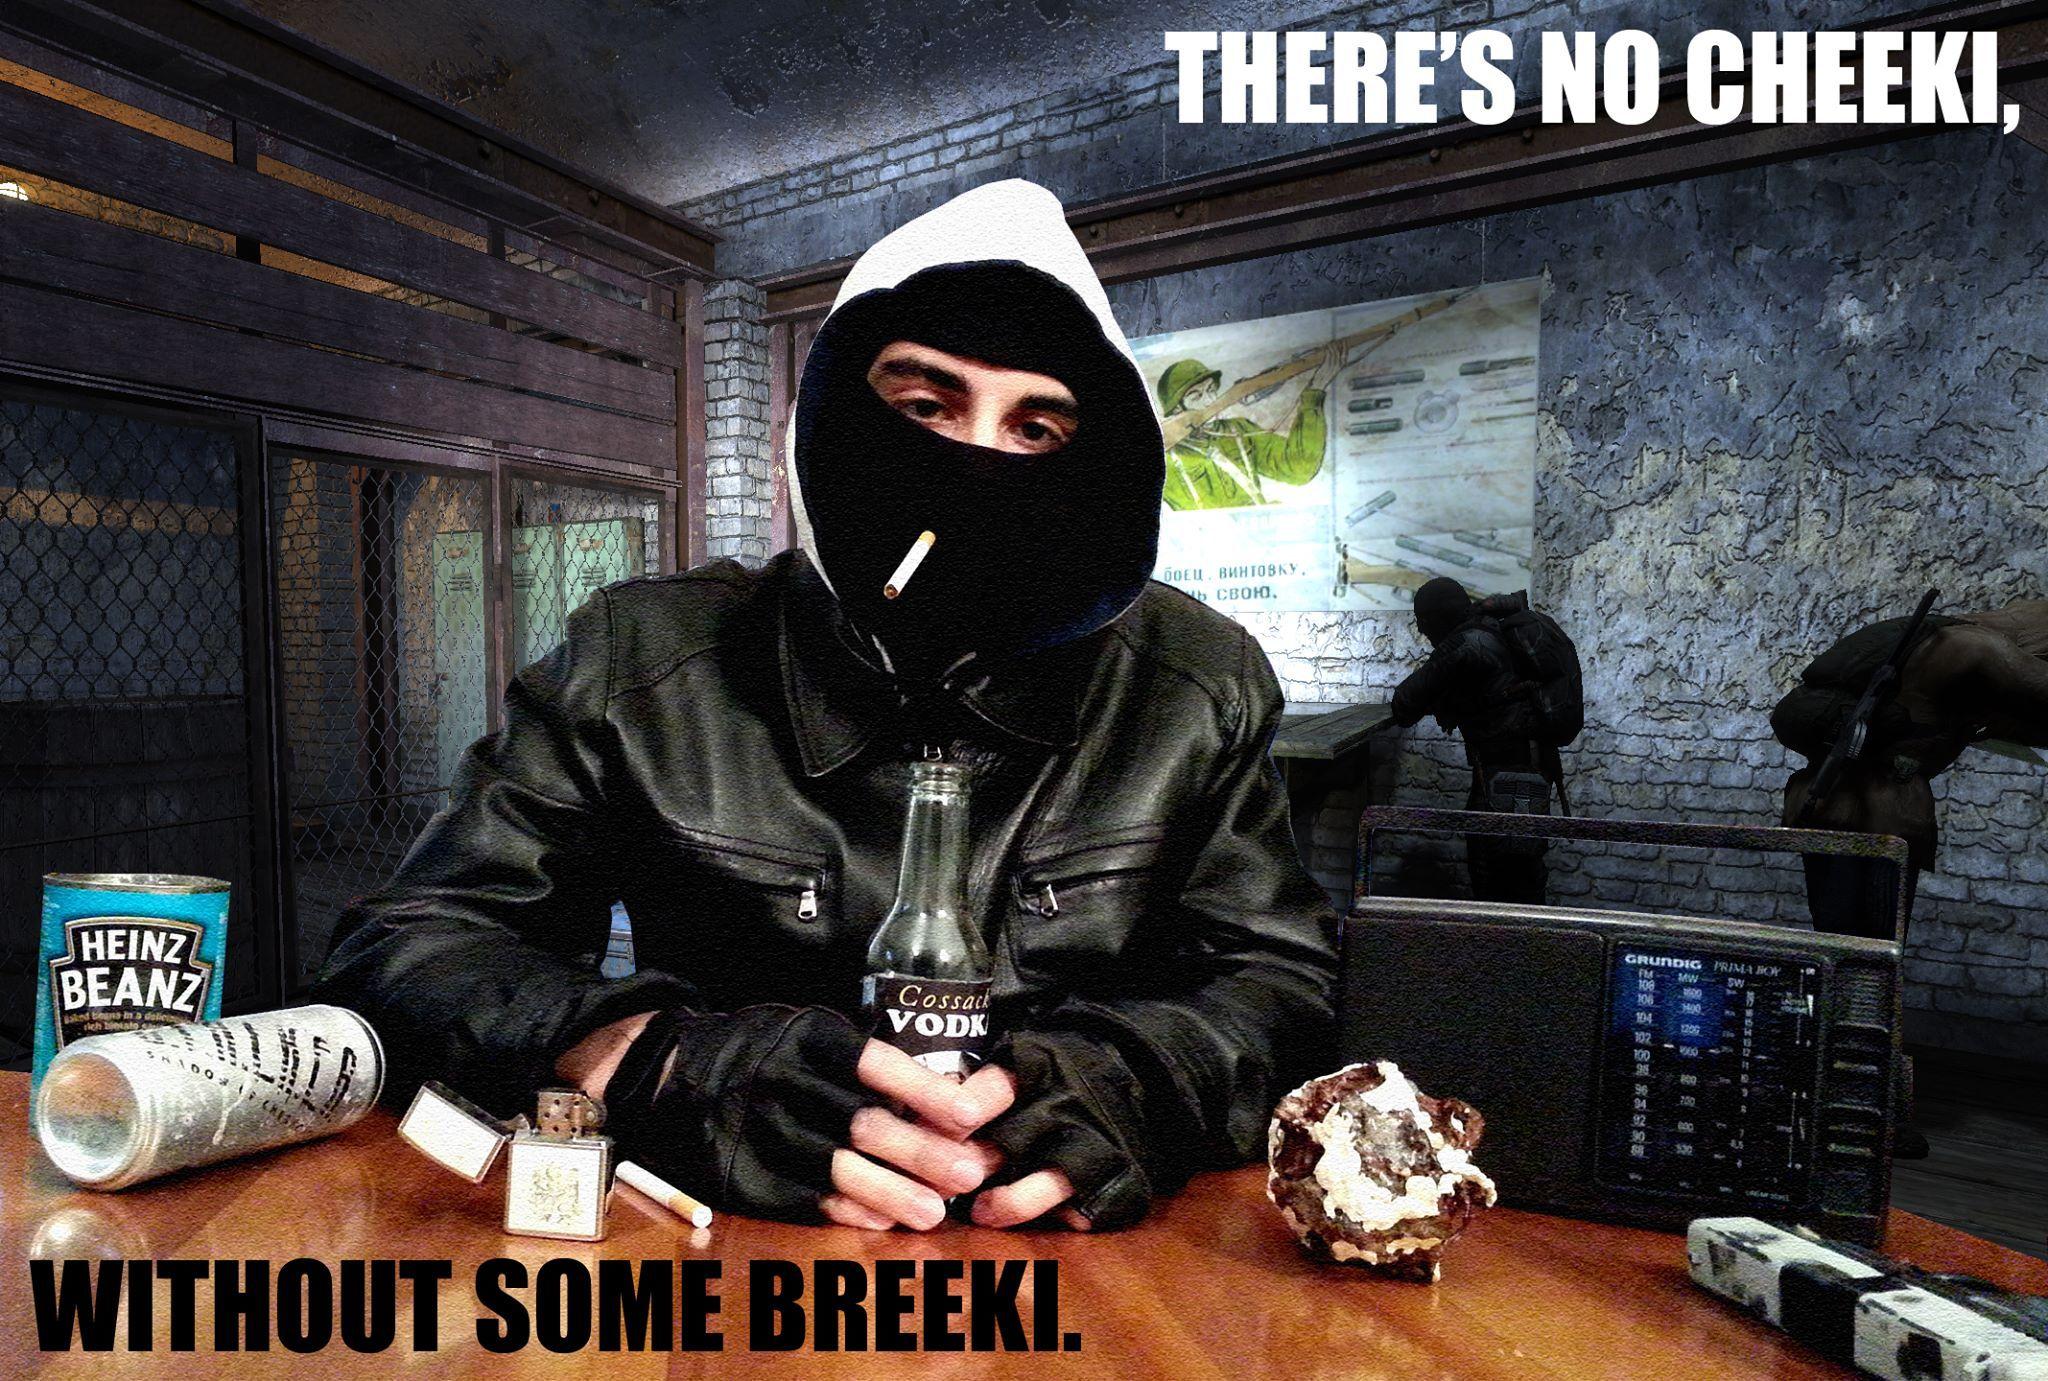 cheeki breeki Апокалипсис, Разное, Юмор